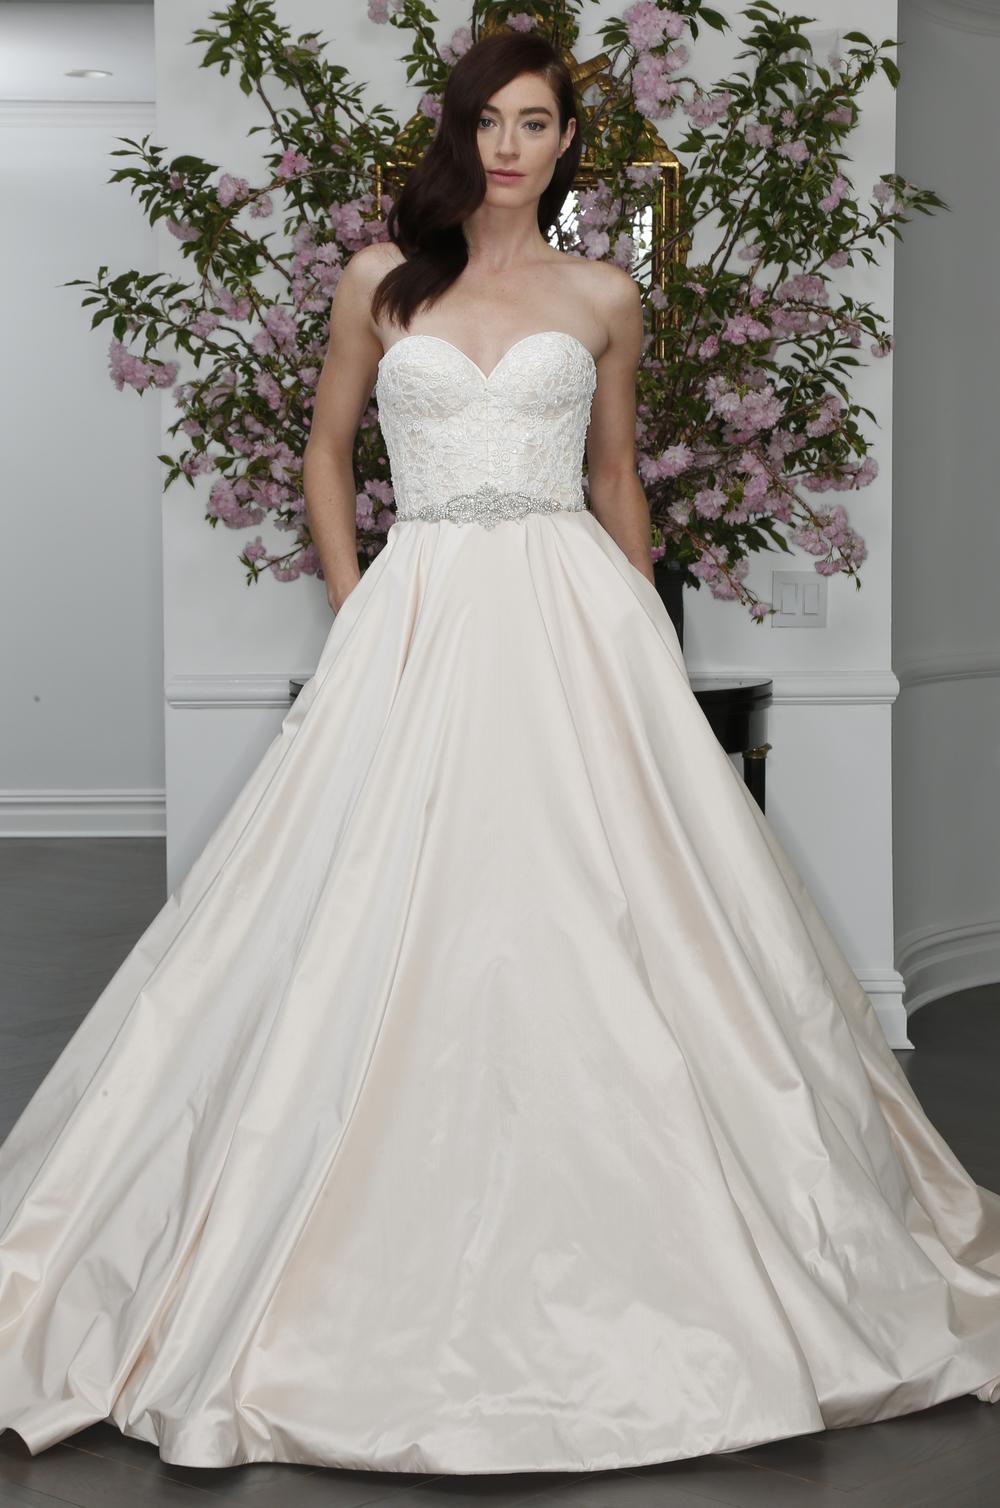 eb412cf8c8 Romona Keveza Legends — Columbus Ohio Designer Bridal Gowns - La Jeune  Mariee Collection